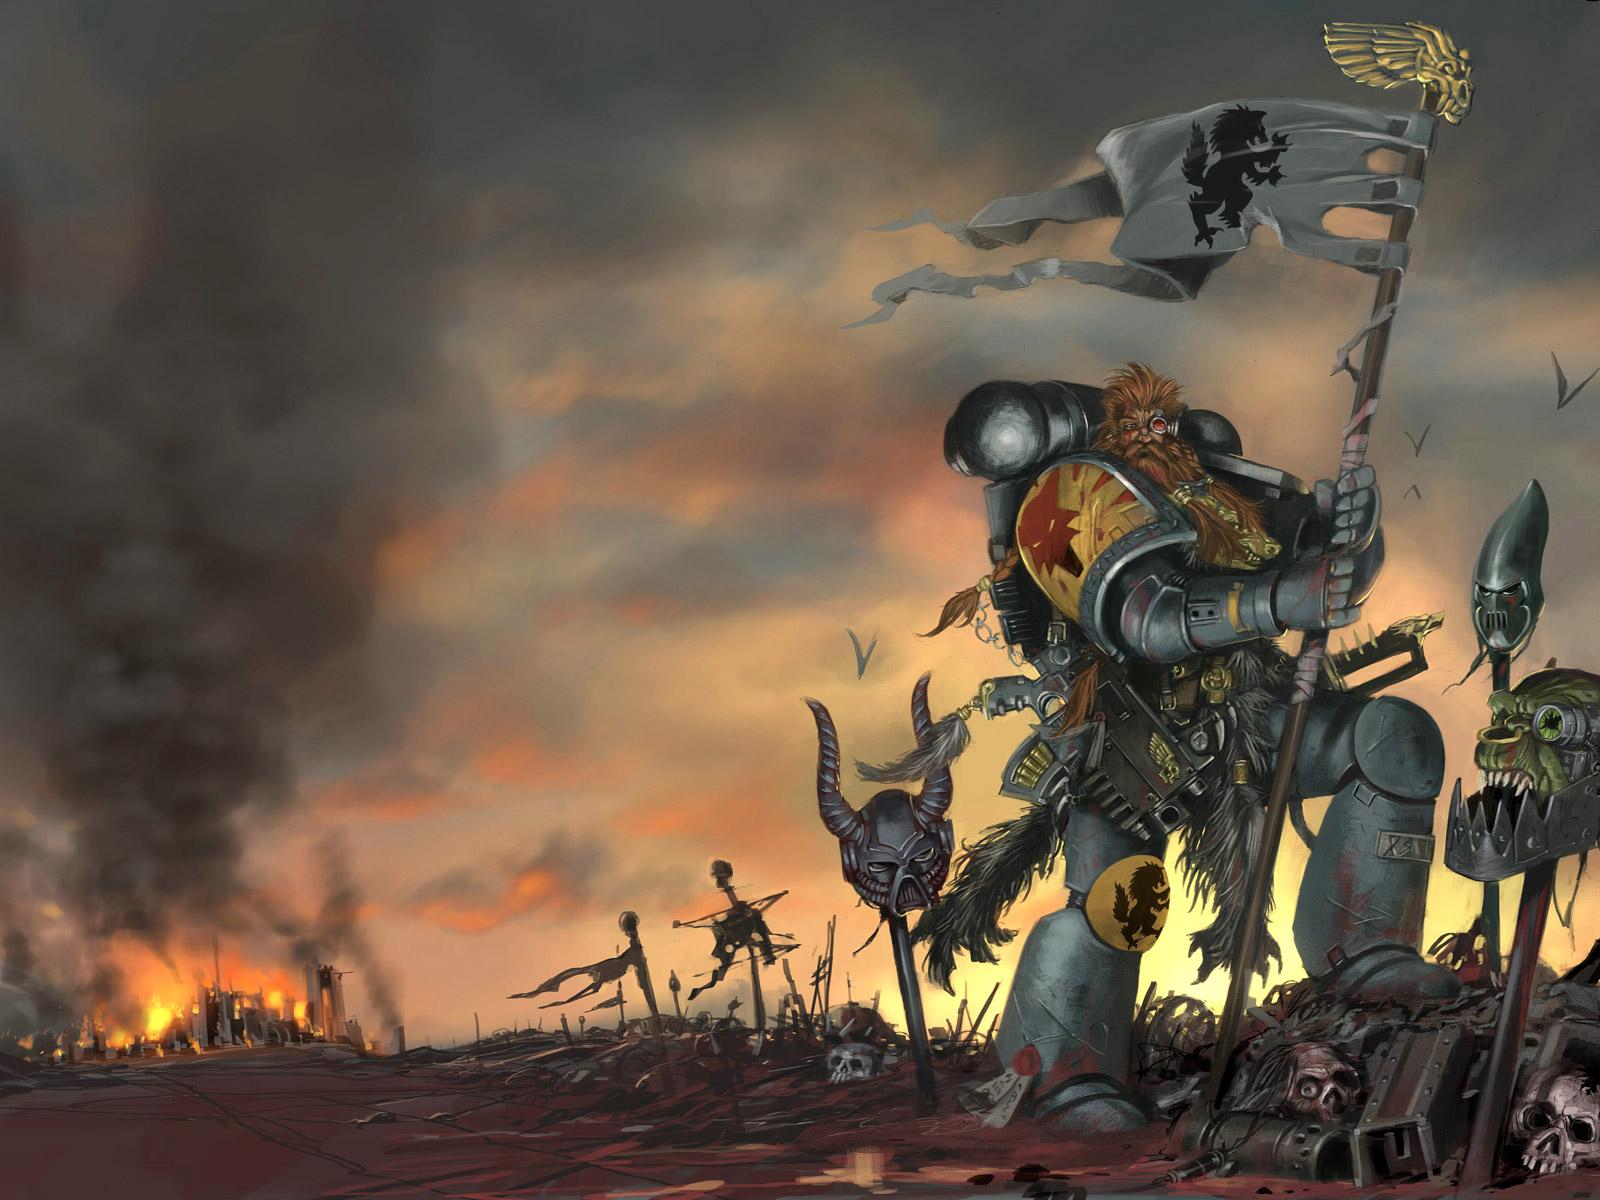 Warhammer clipart 1080p Wh http://4 Wallpapers com/_RfD80Ww88ew/TRwRBzYiv3I/ blogspot